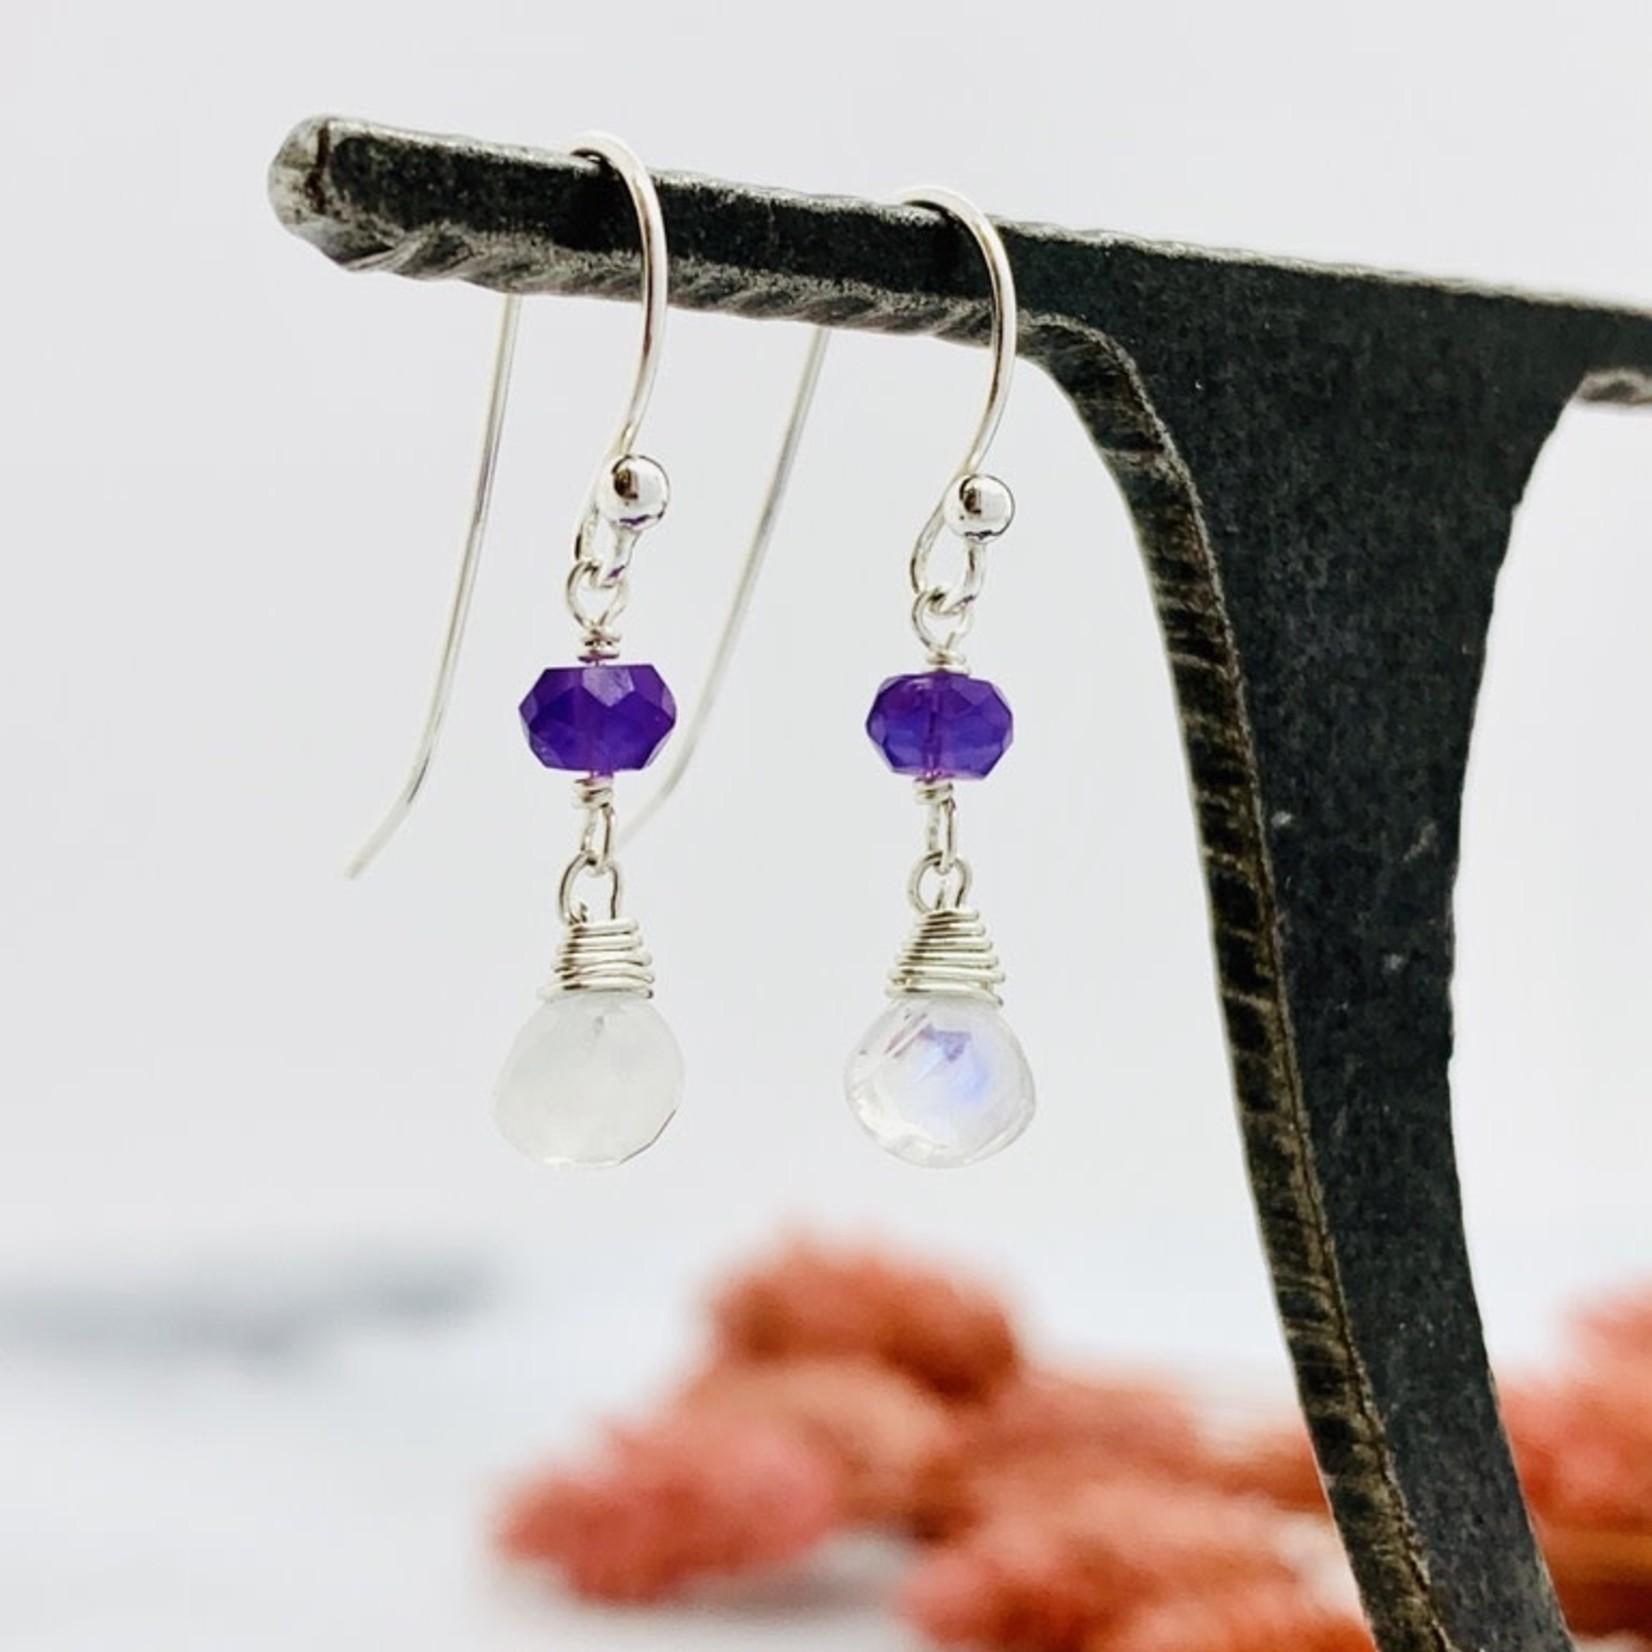 Handmade rainbow moonstone briolette, amethyst Earrings